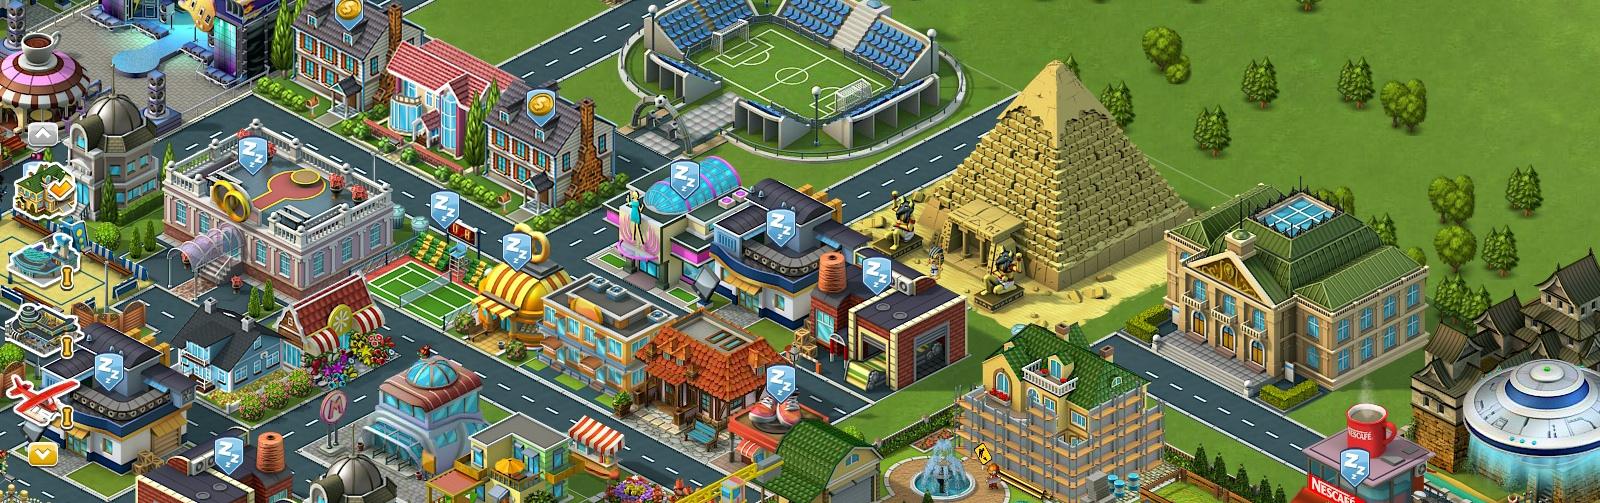 Playkot's SuperCity game graphics done with Blender, Krita, GIMP